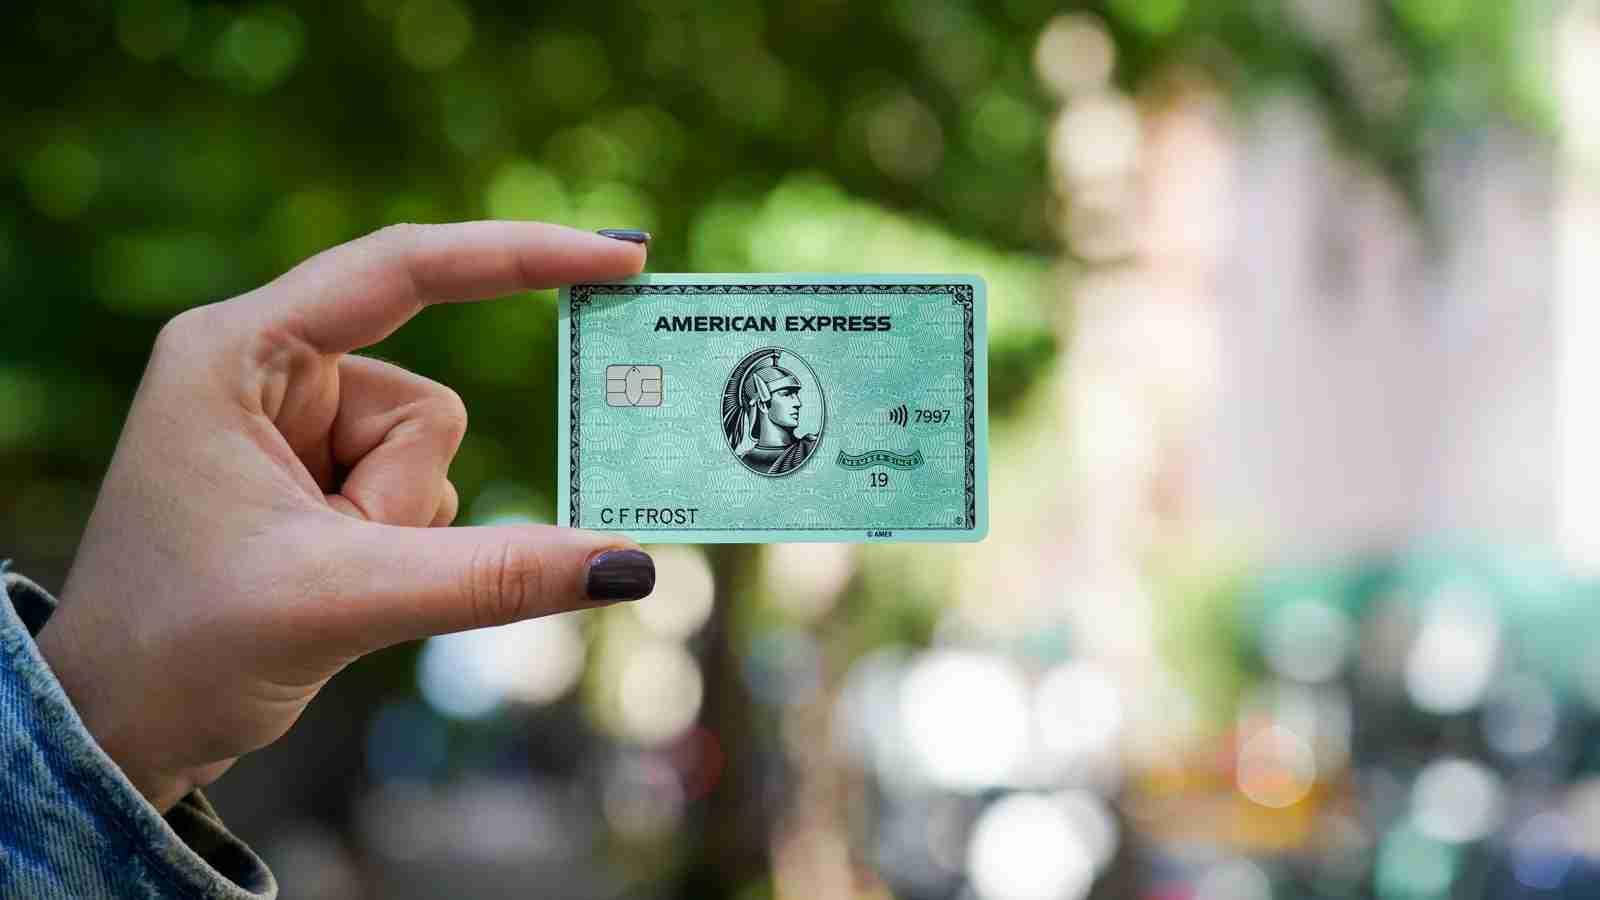 American Express Green_2019